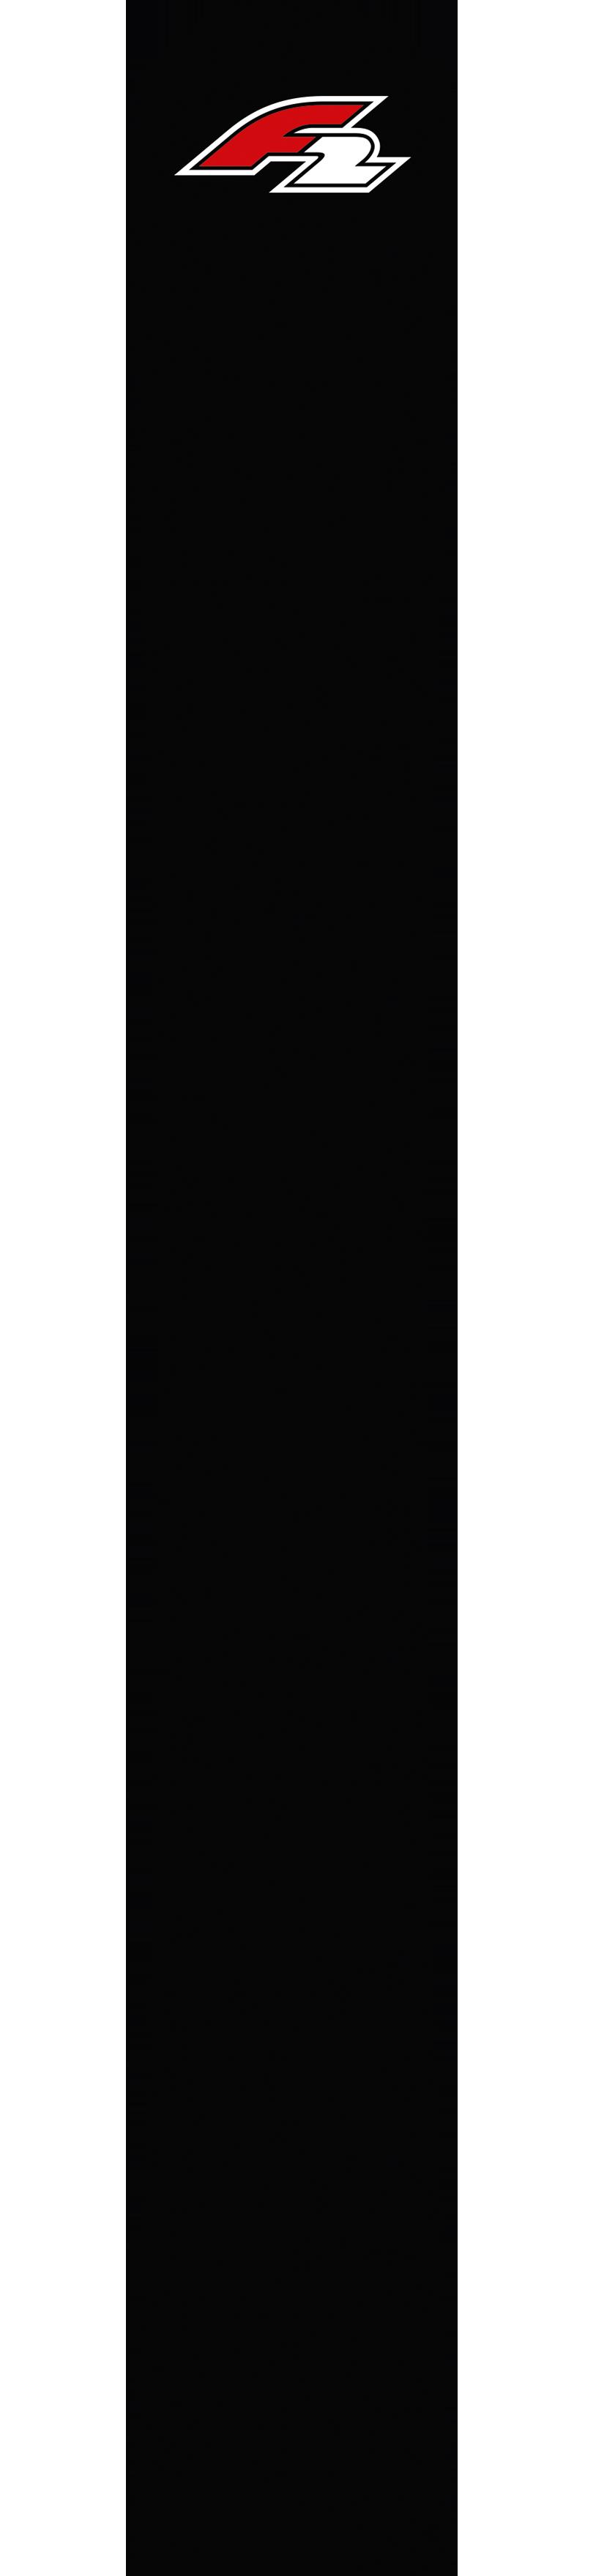 SPEEDSTER EQUIPE RS TX CARBON - Base